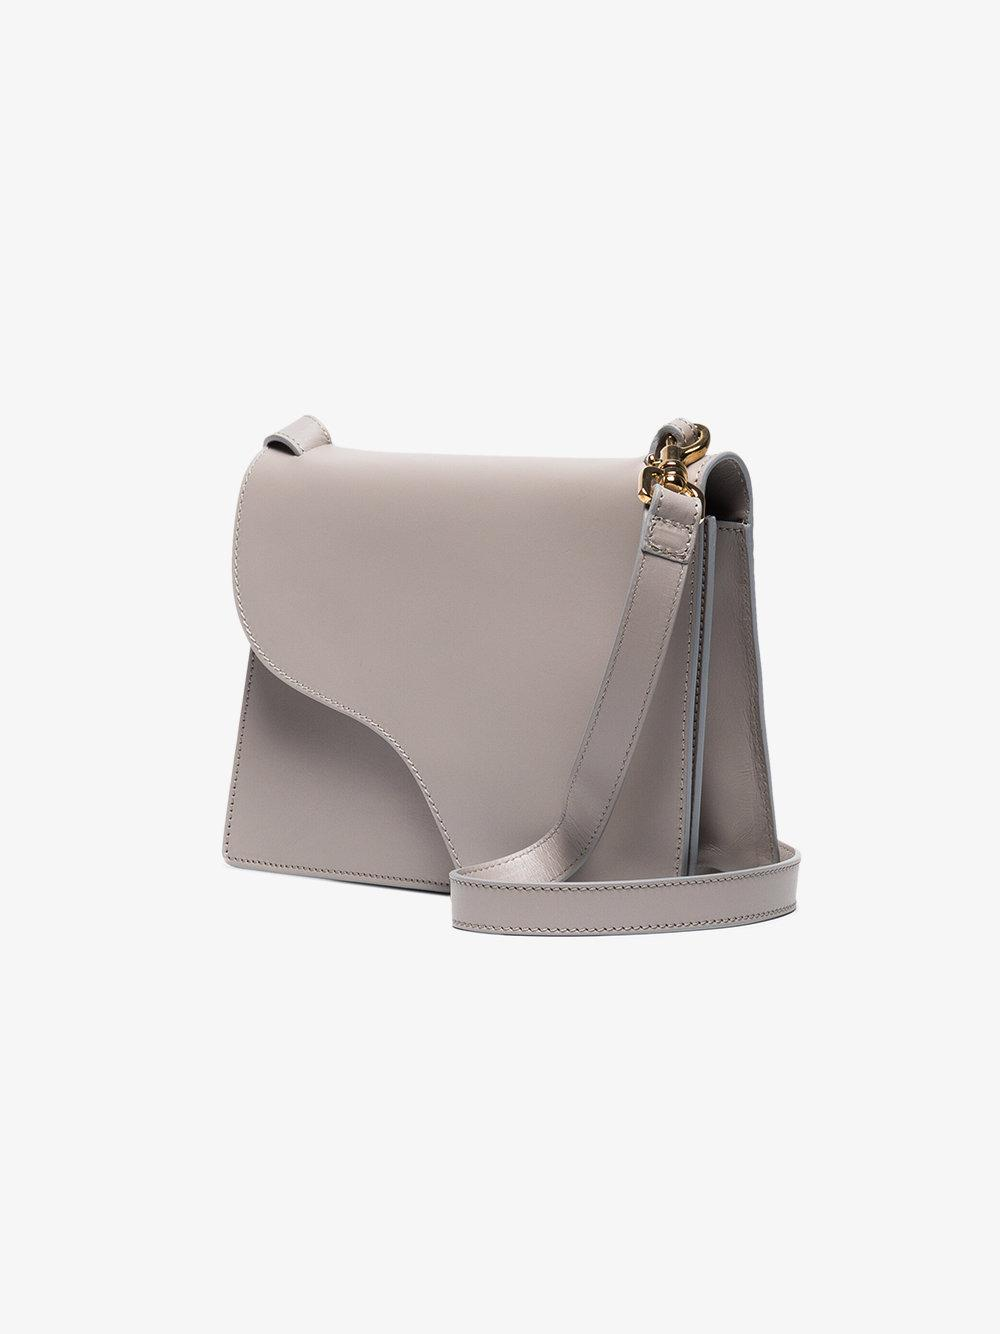 Atp Atelier Leather Grey Siena Cross-body Bag in Grey